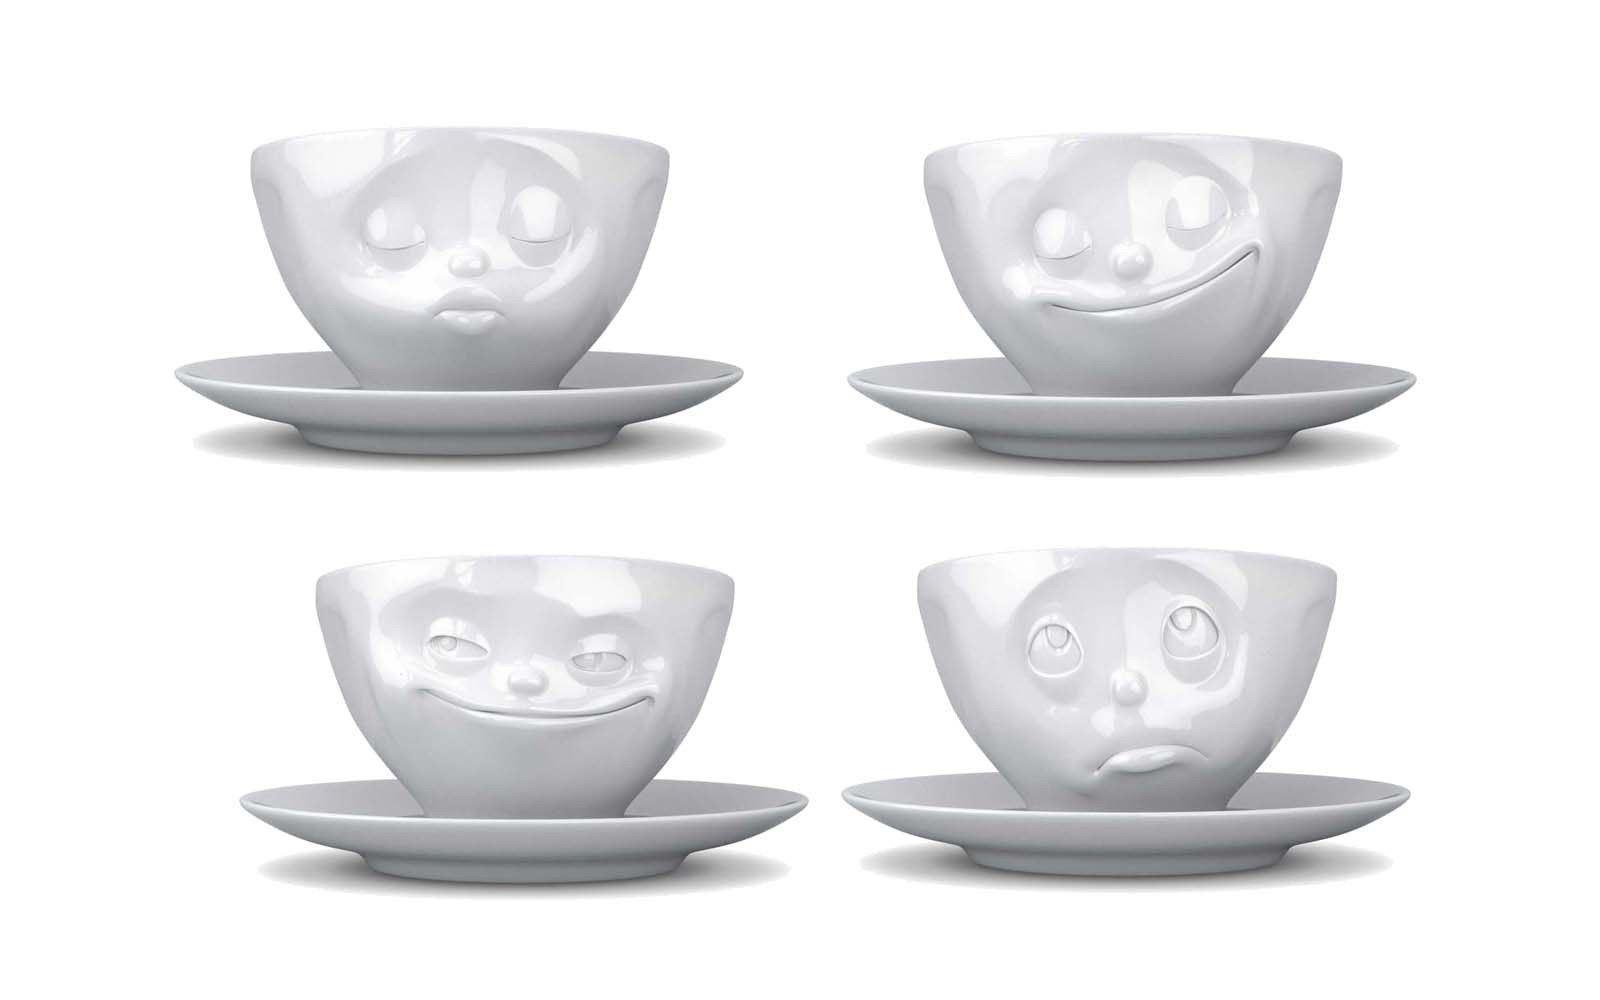 1 tassen padmaschine kaffeepad automat kaffeemaschine pad maschine 1 tasse wmf one 4 tassen. Black Bedroom Furniture Sets. Home Design Ideas